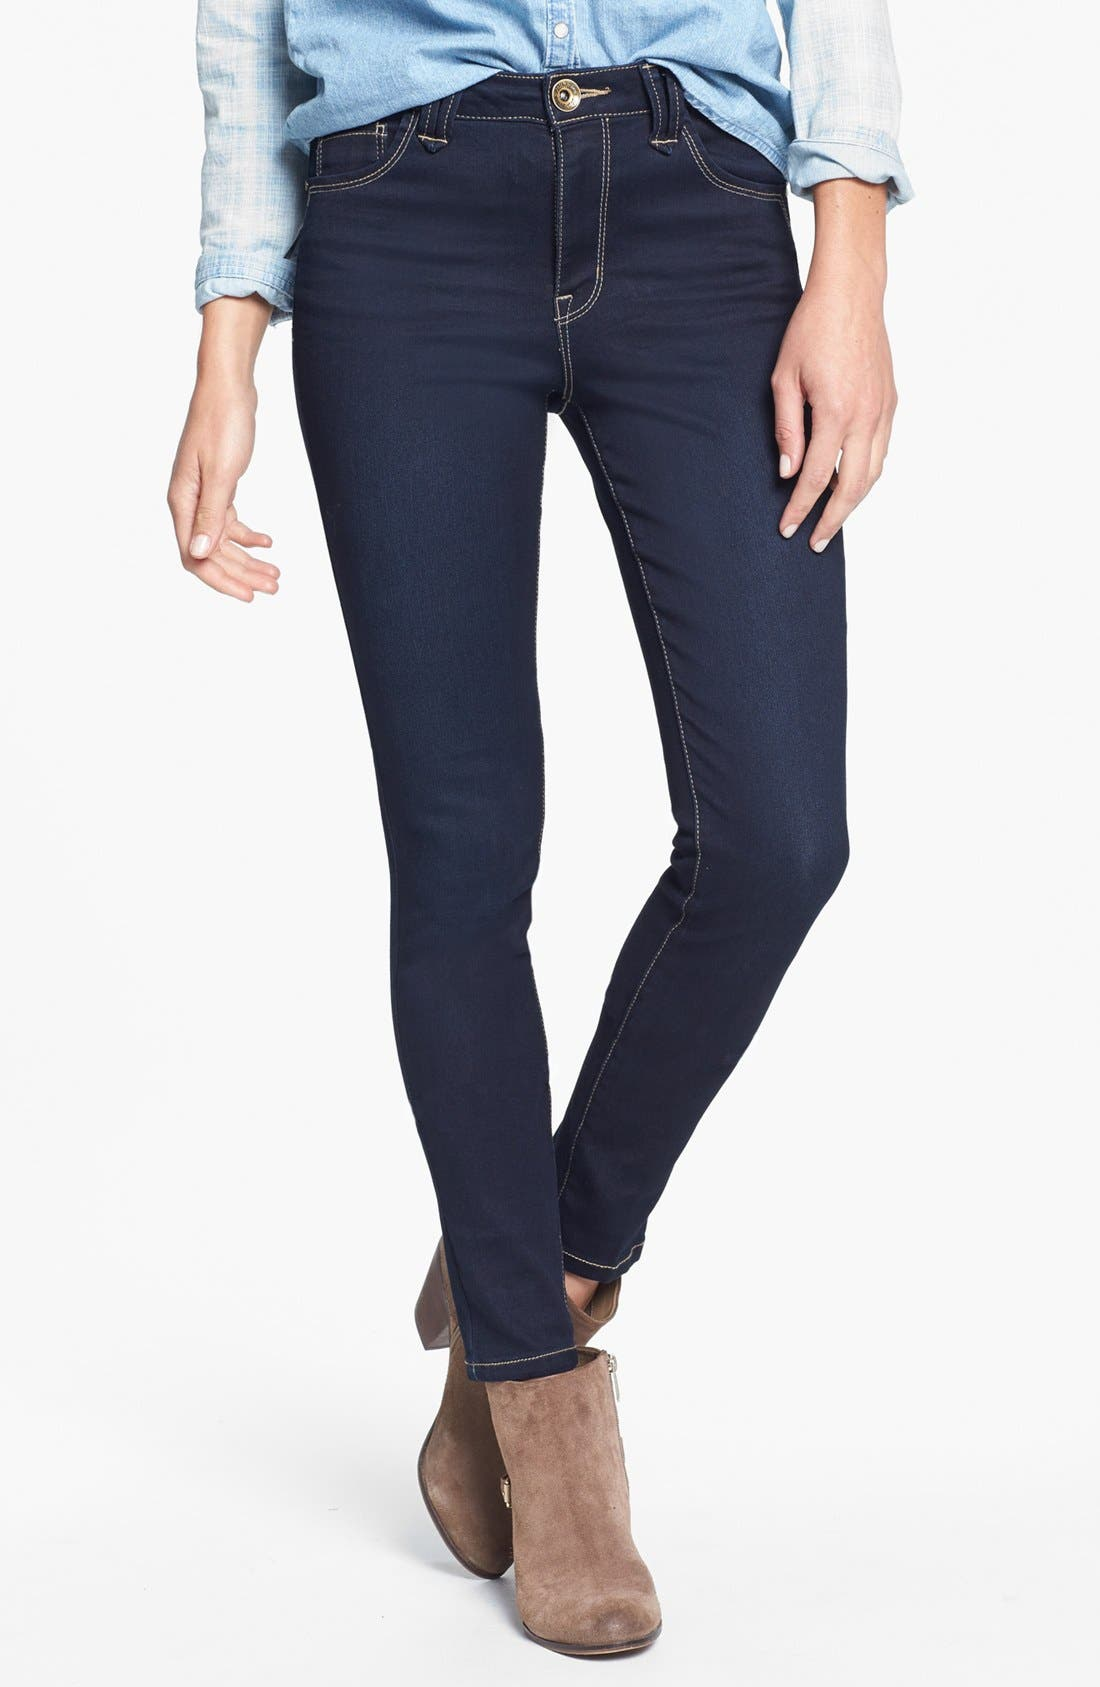 Alternate Image 1 Selected - Jolt High Waist Skinny Jeans (Dark) (Juniors)